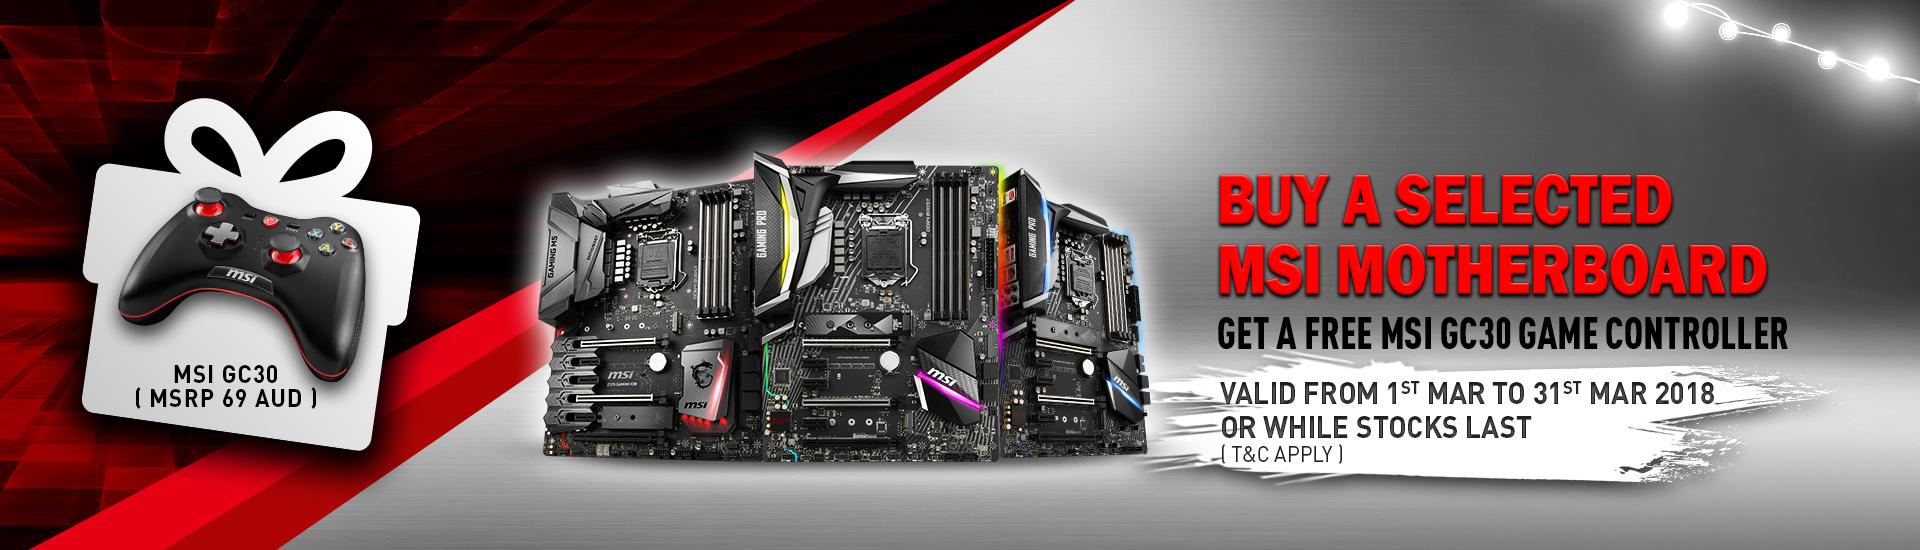 Get A Bonus MSI GC30 Gaming Controller With Selected MSI Gaming Motherboard